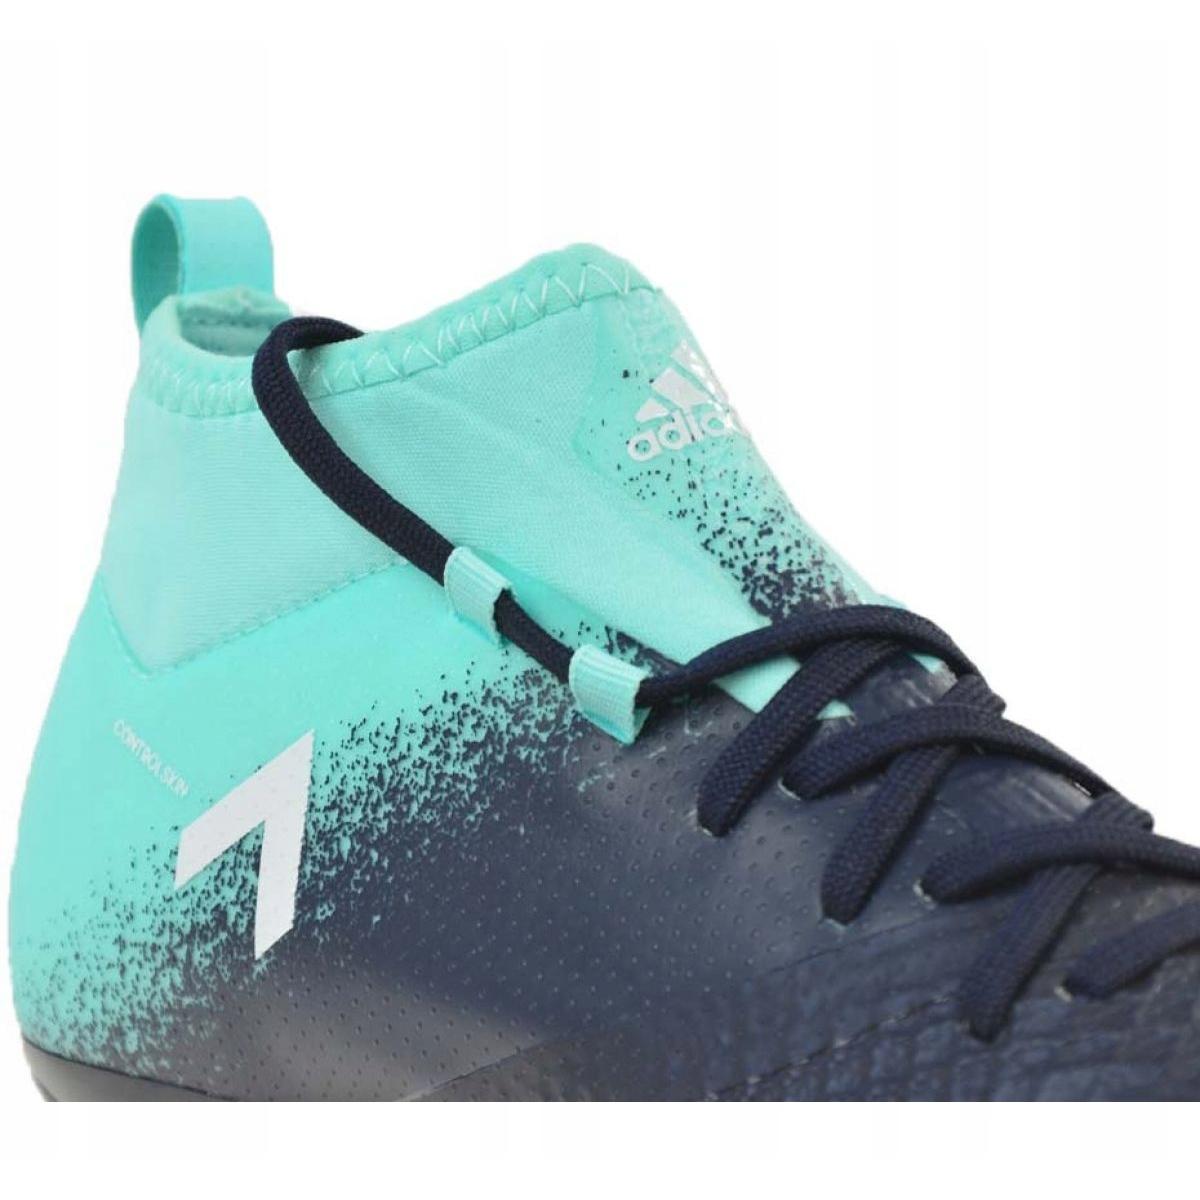 quality design 0edb5 99293 Adidas Ace 17.1 Fg Jr S77040 football shoes